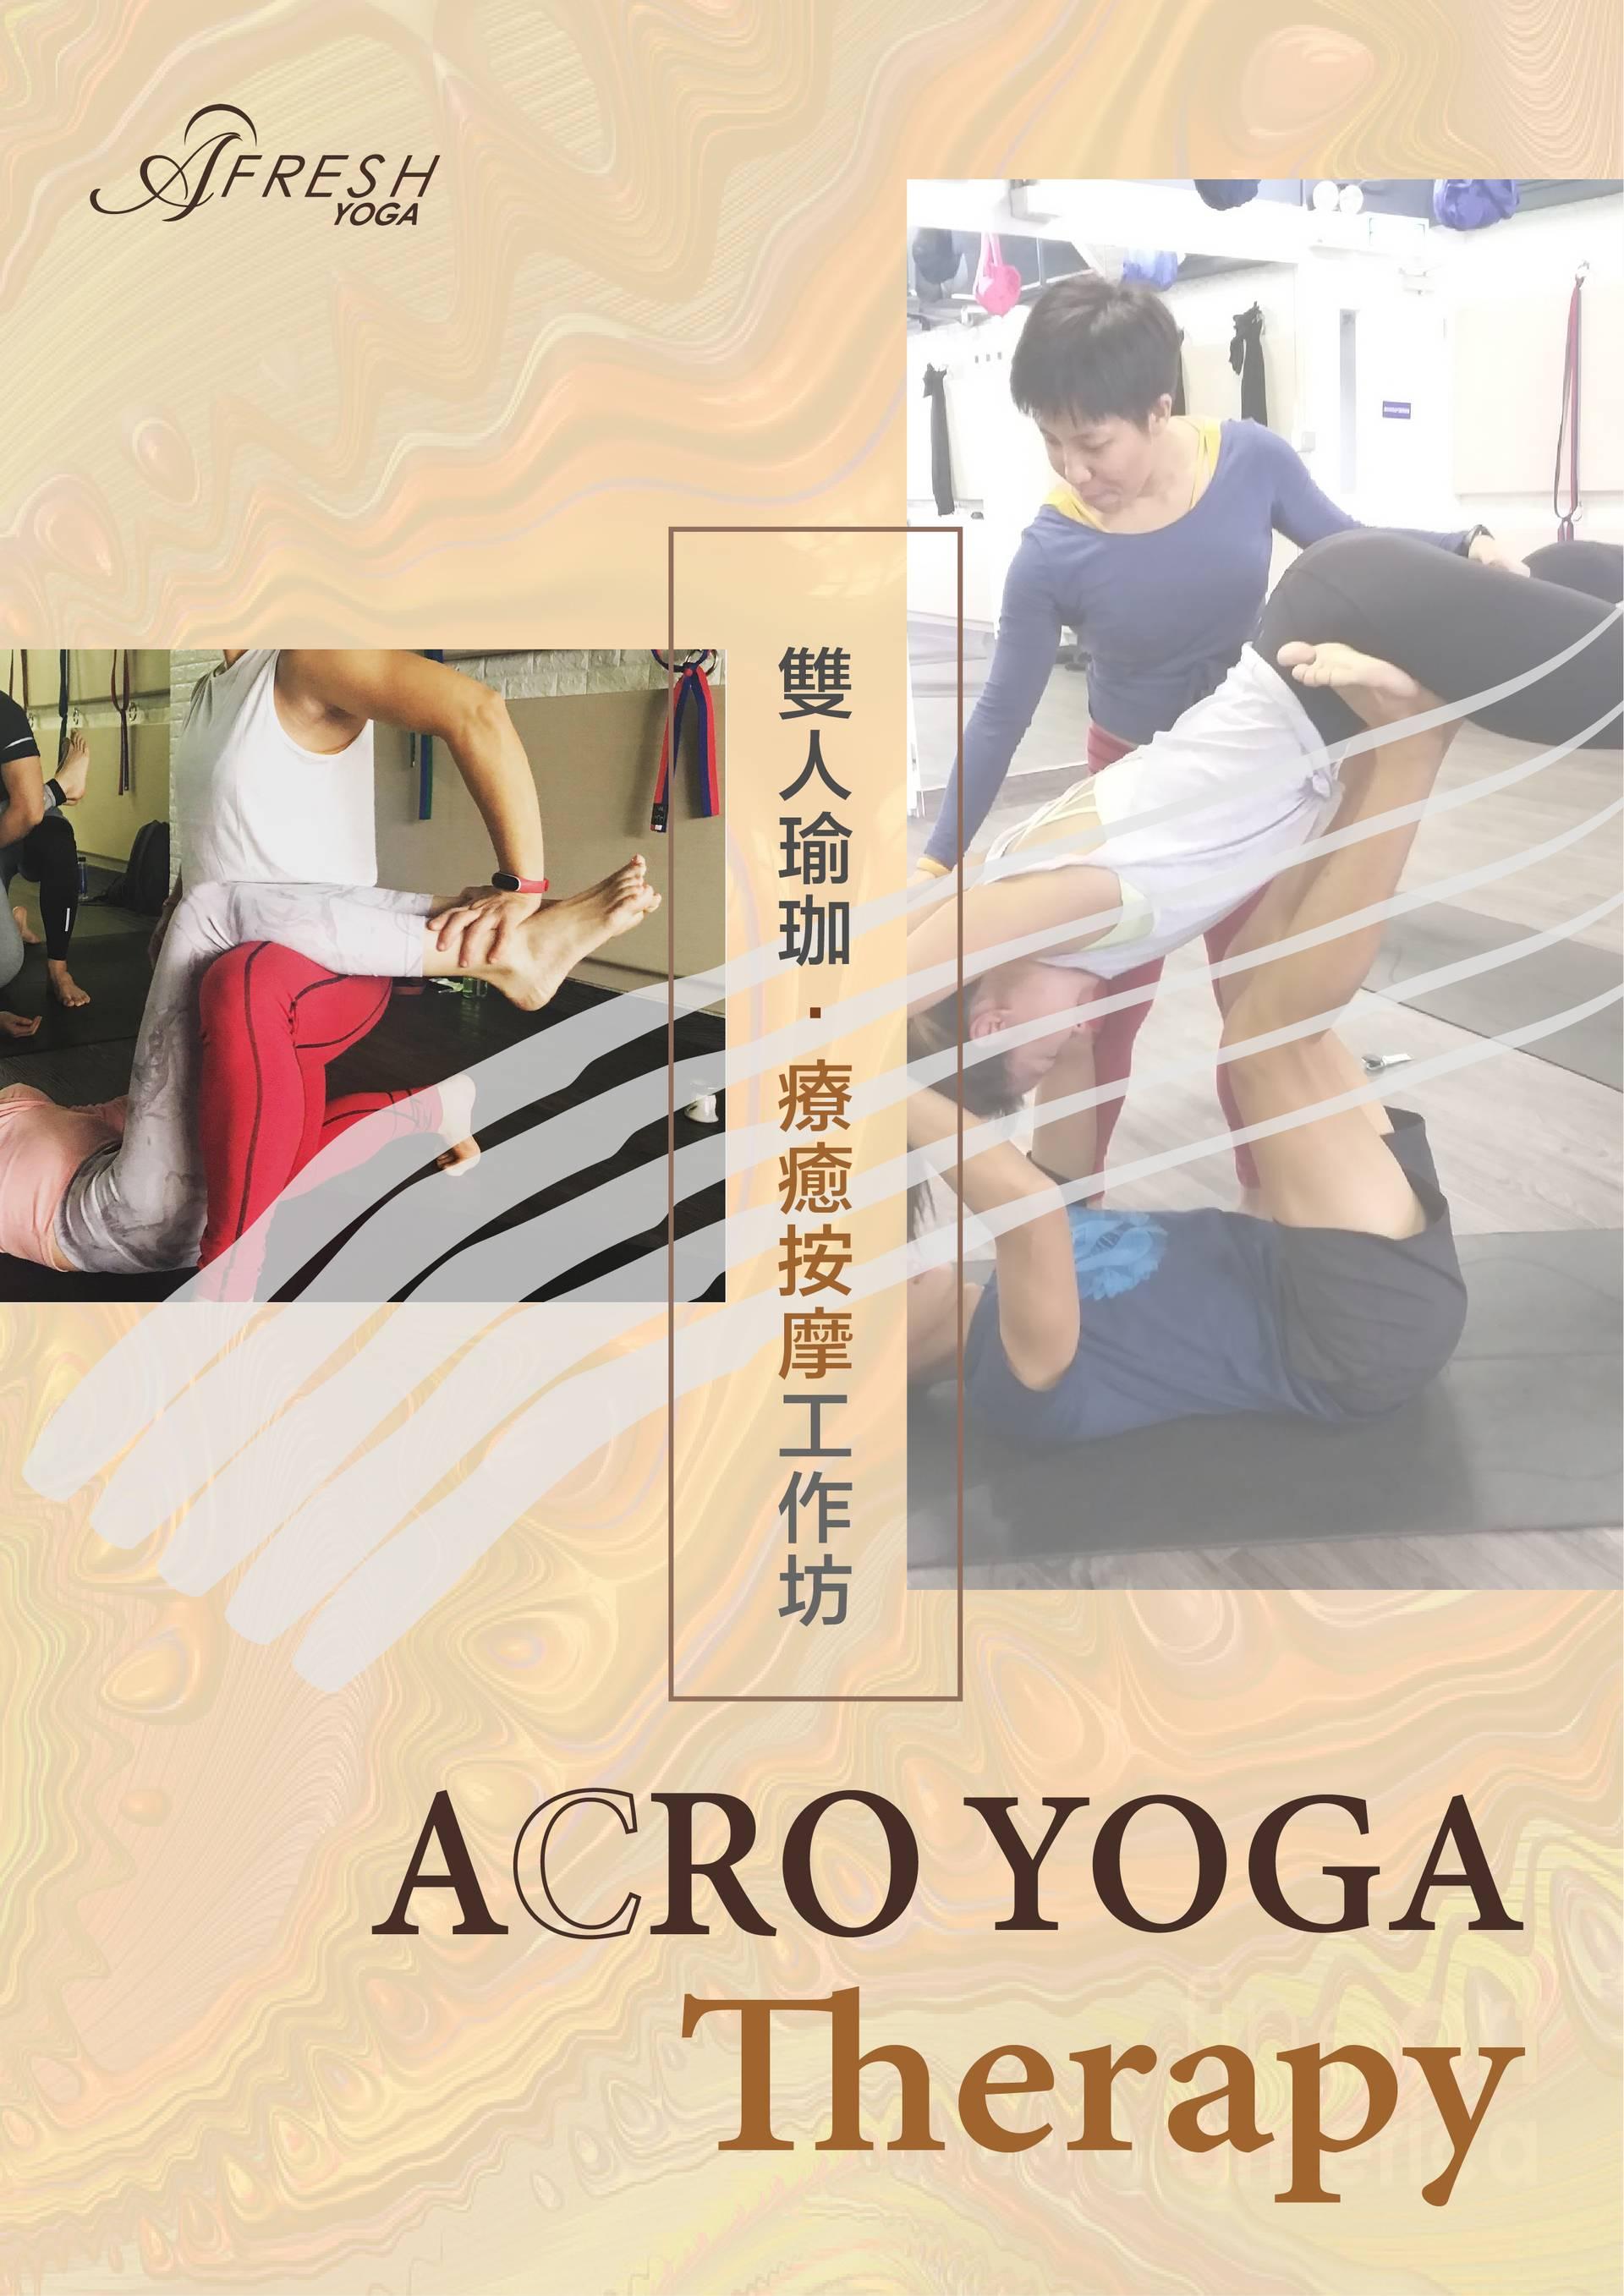 Acro Yoga Therapy雙人瑜伽 ‧ 療癒按摩工作坊